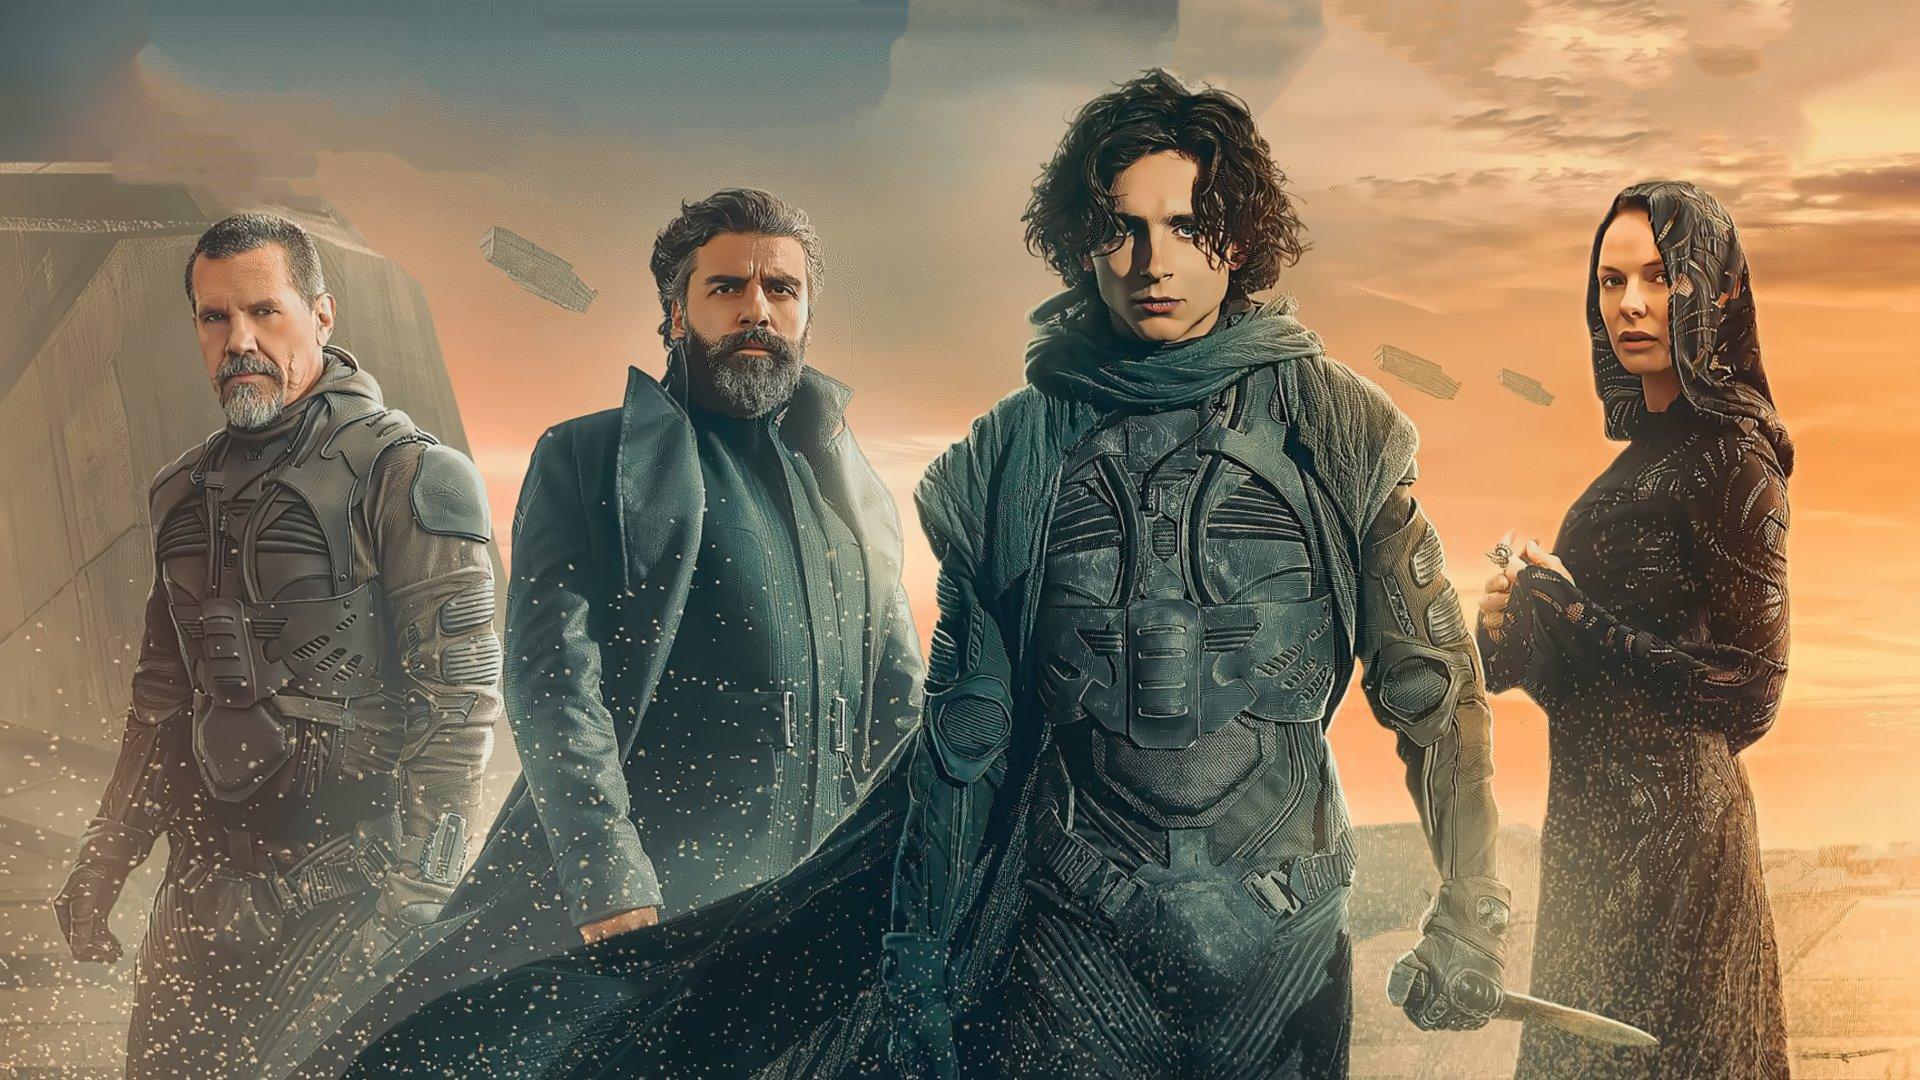 AL FIN: ¡Dune de Denis Villeneuve estrena primer tráiler!